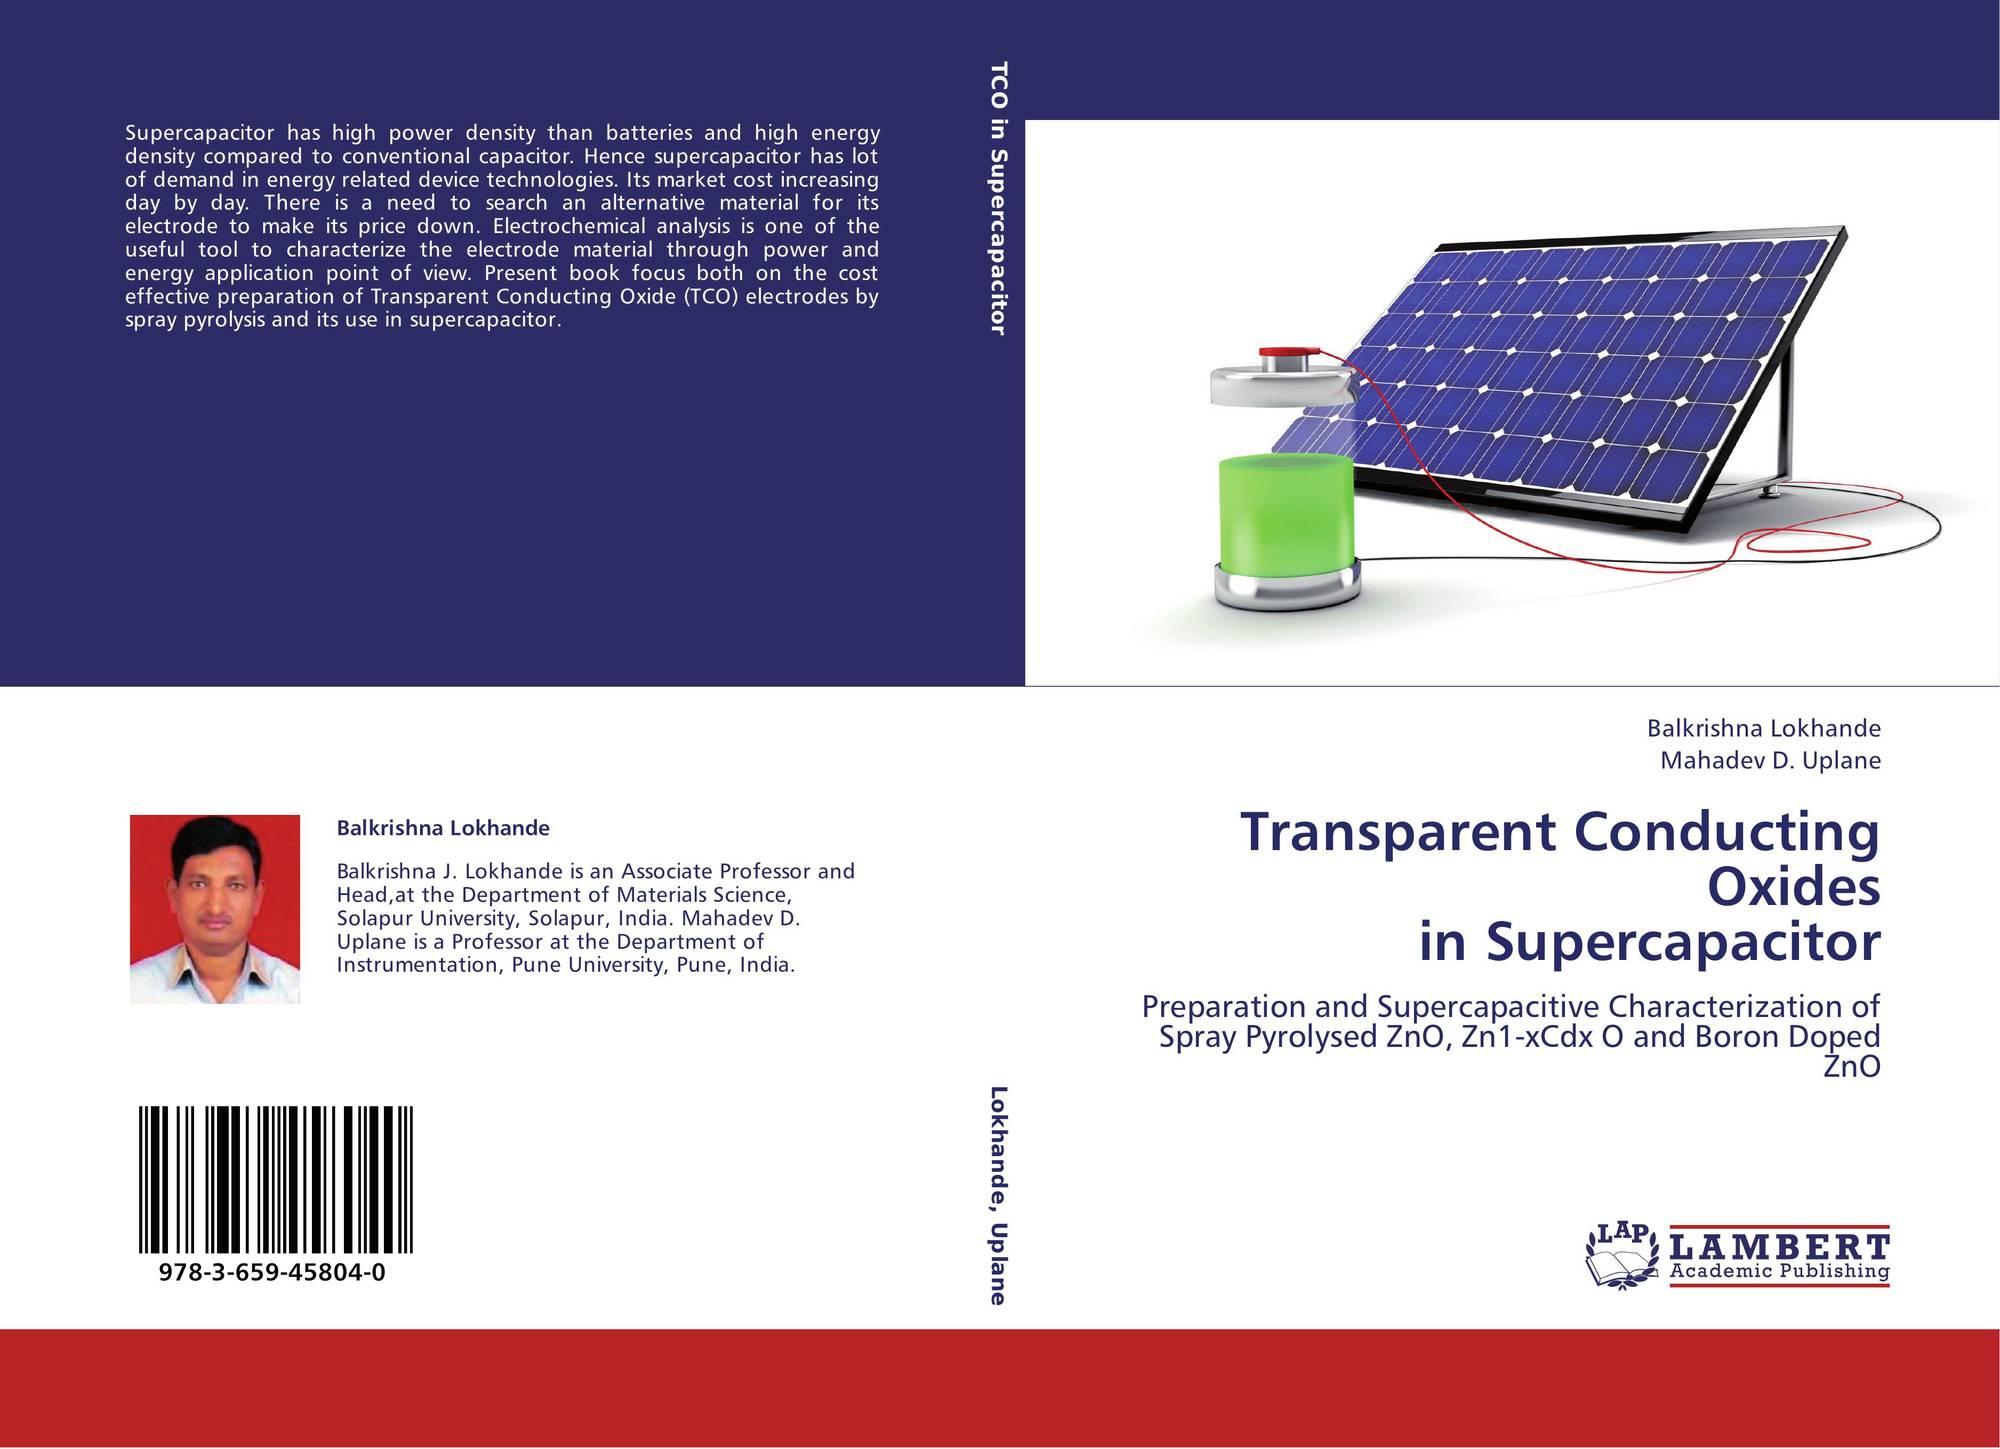 Transparent Conducting Oxides in Supercapacitor, 978-3-659